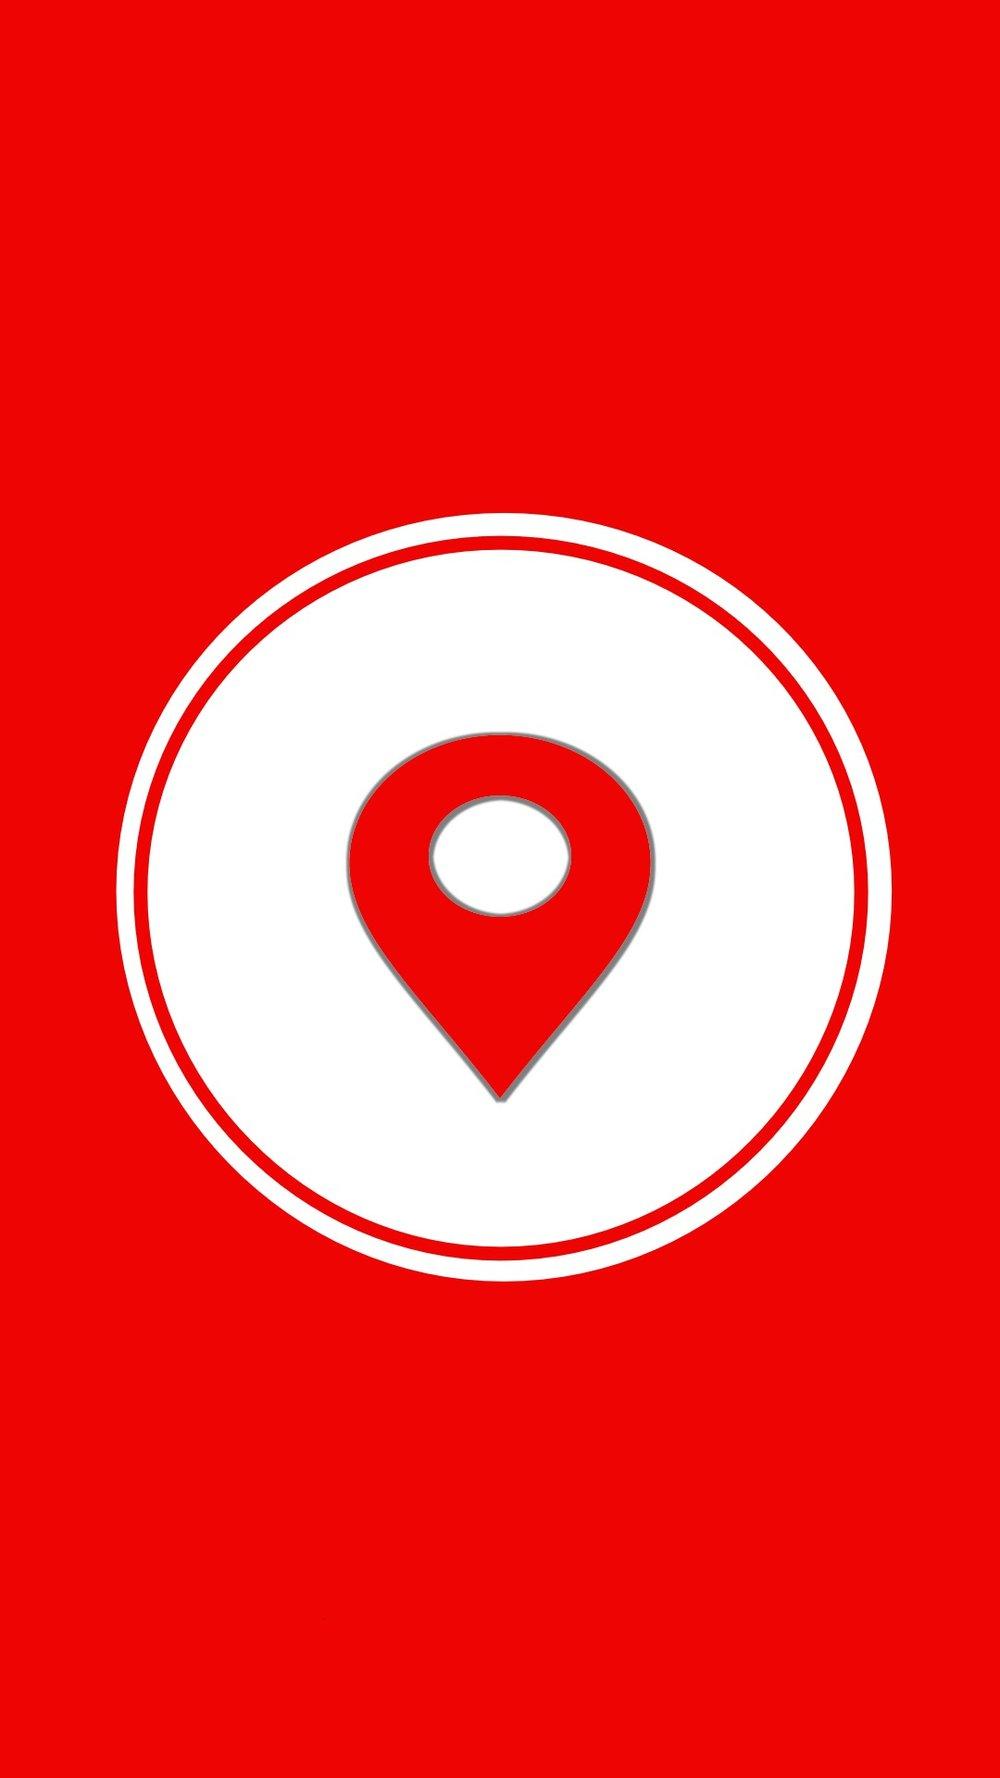 Instagram-cover-location-red-lotnotes.com.jpg